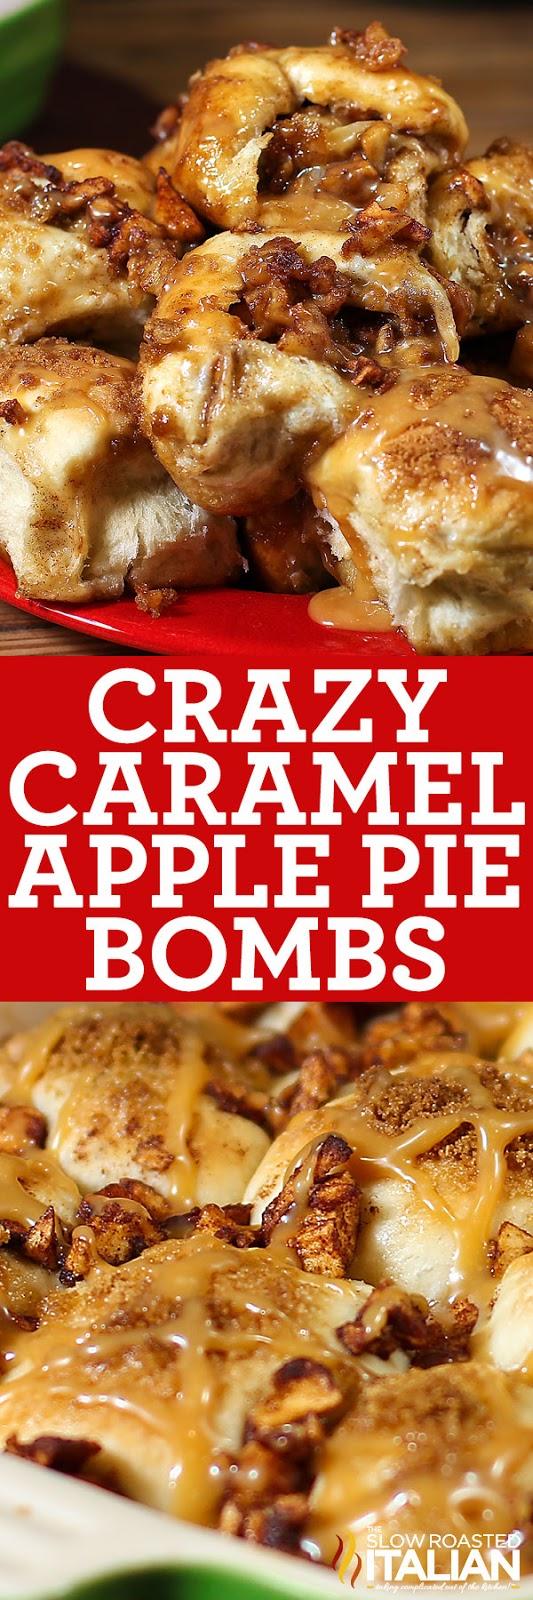 Crazy Caramel Apple Pie Bombs (With Video) Caramel apple